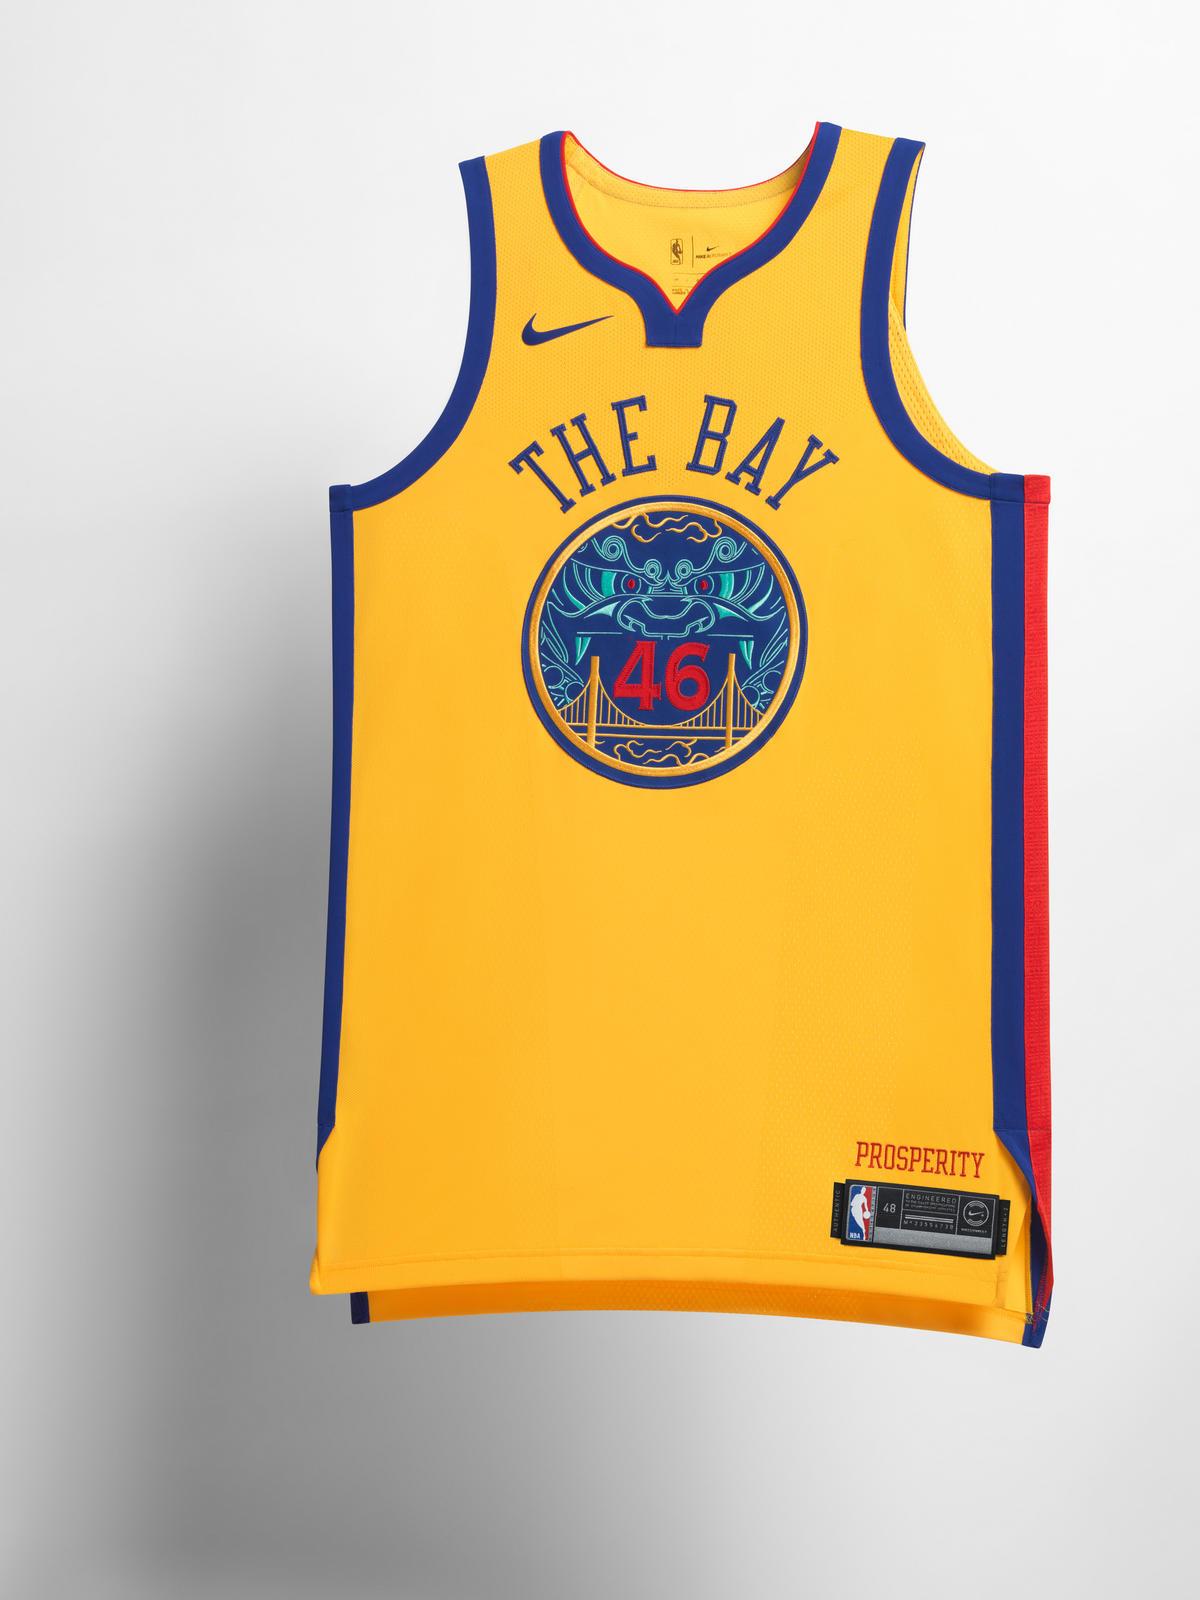 Nike_NBA_City_Edition_Uniform_Golden_State_Warriors_0067_native_1600